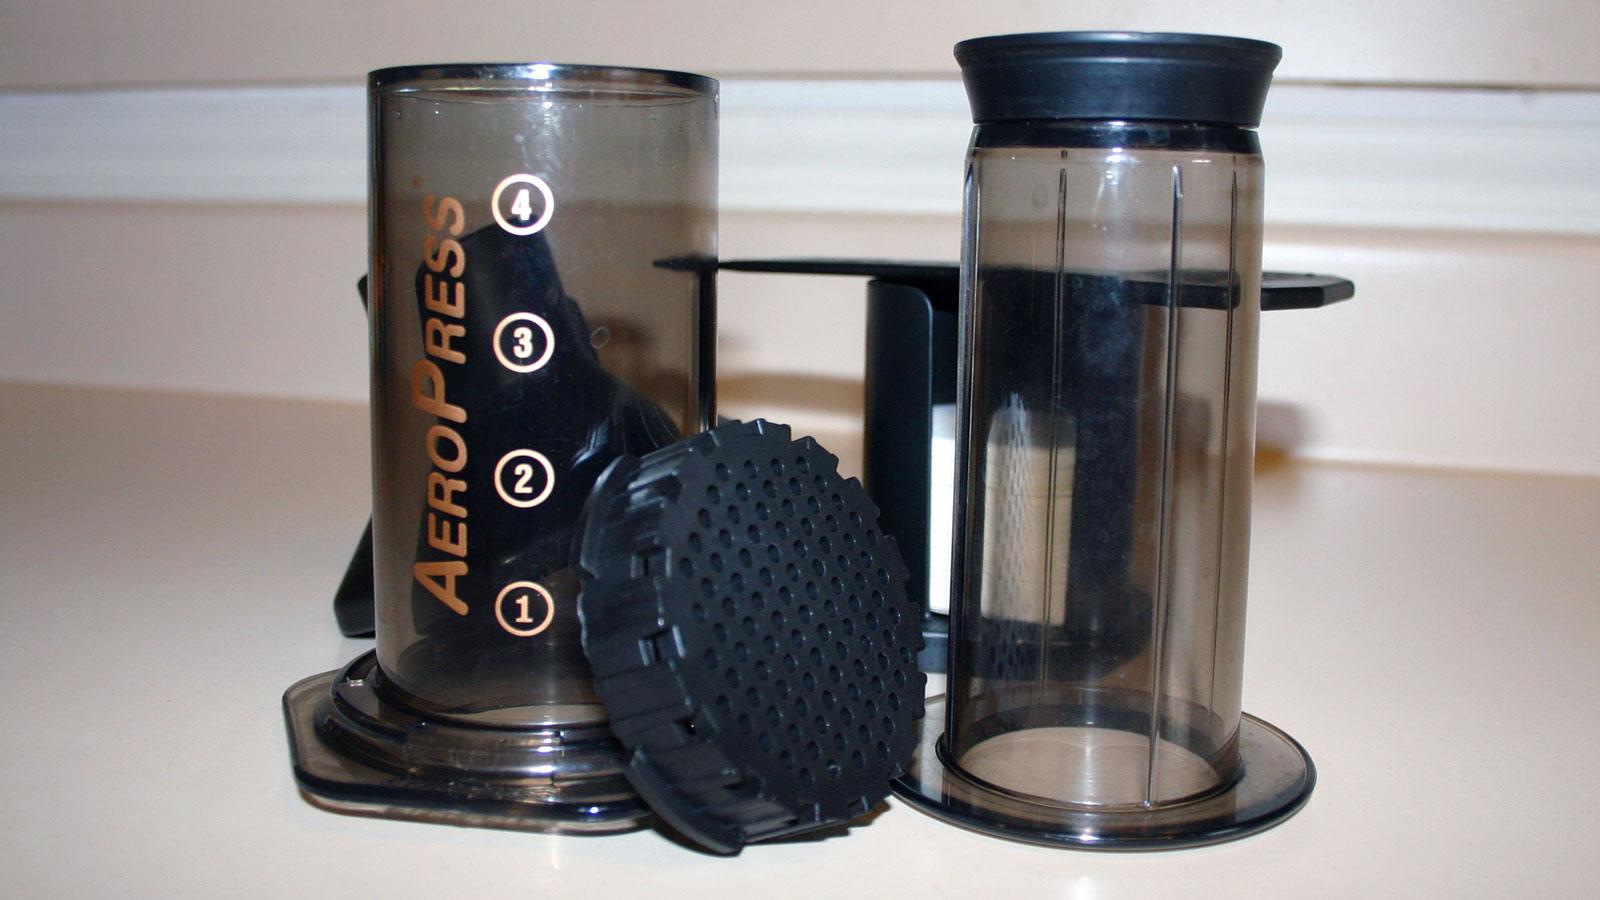 Aeropress Coffee Maker Movie : AeroPress Coffee and Espresso Maker Review from a Dad